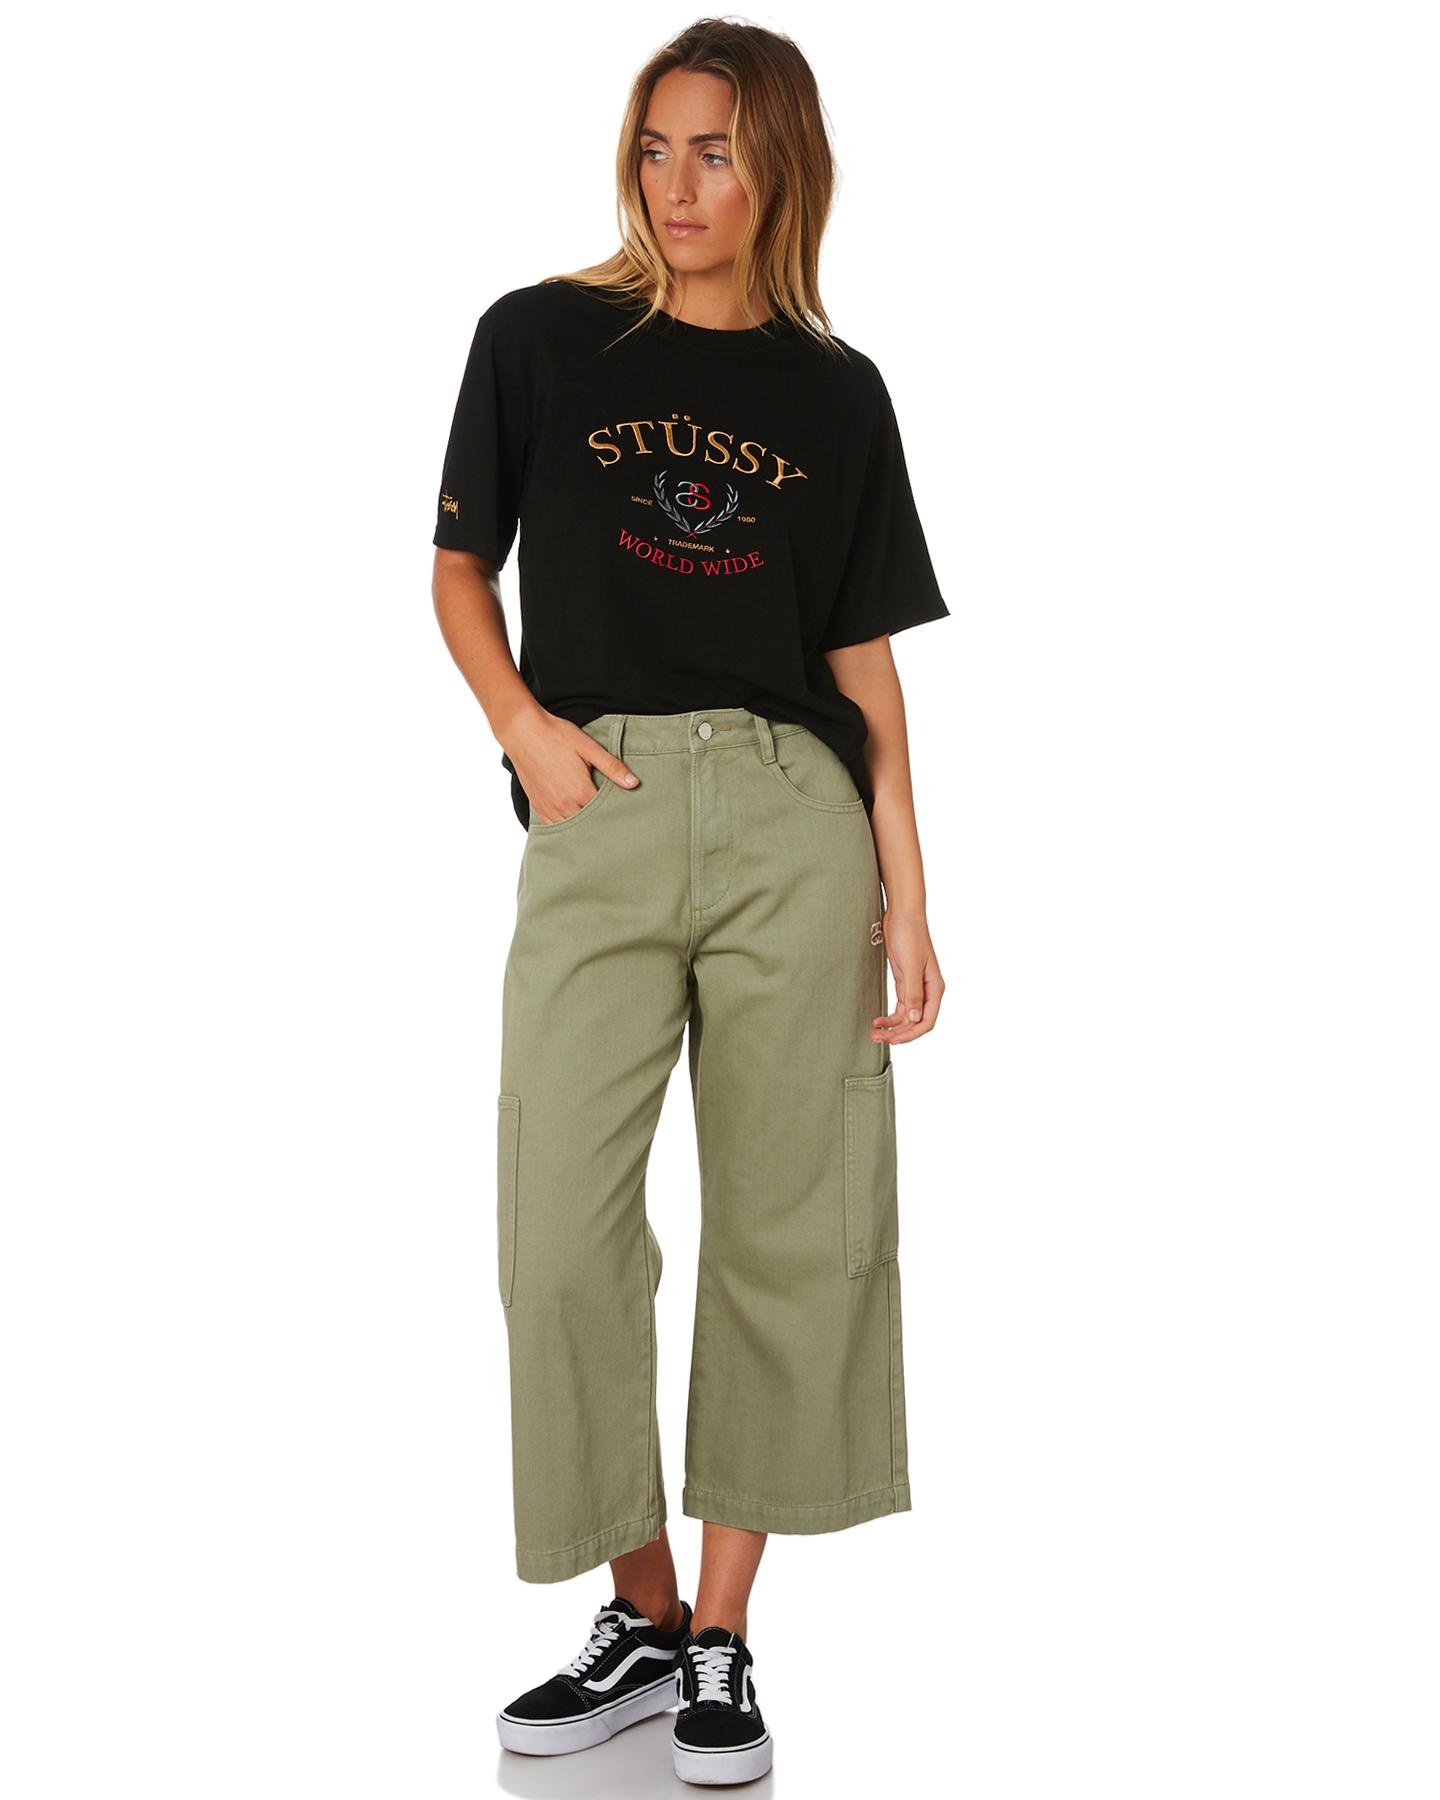 8185f492f74 New Stussy Women s Benson Os Tee Crew Neck Short Sleeve Cotton ...